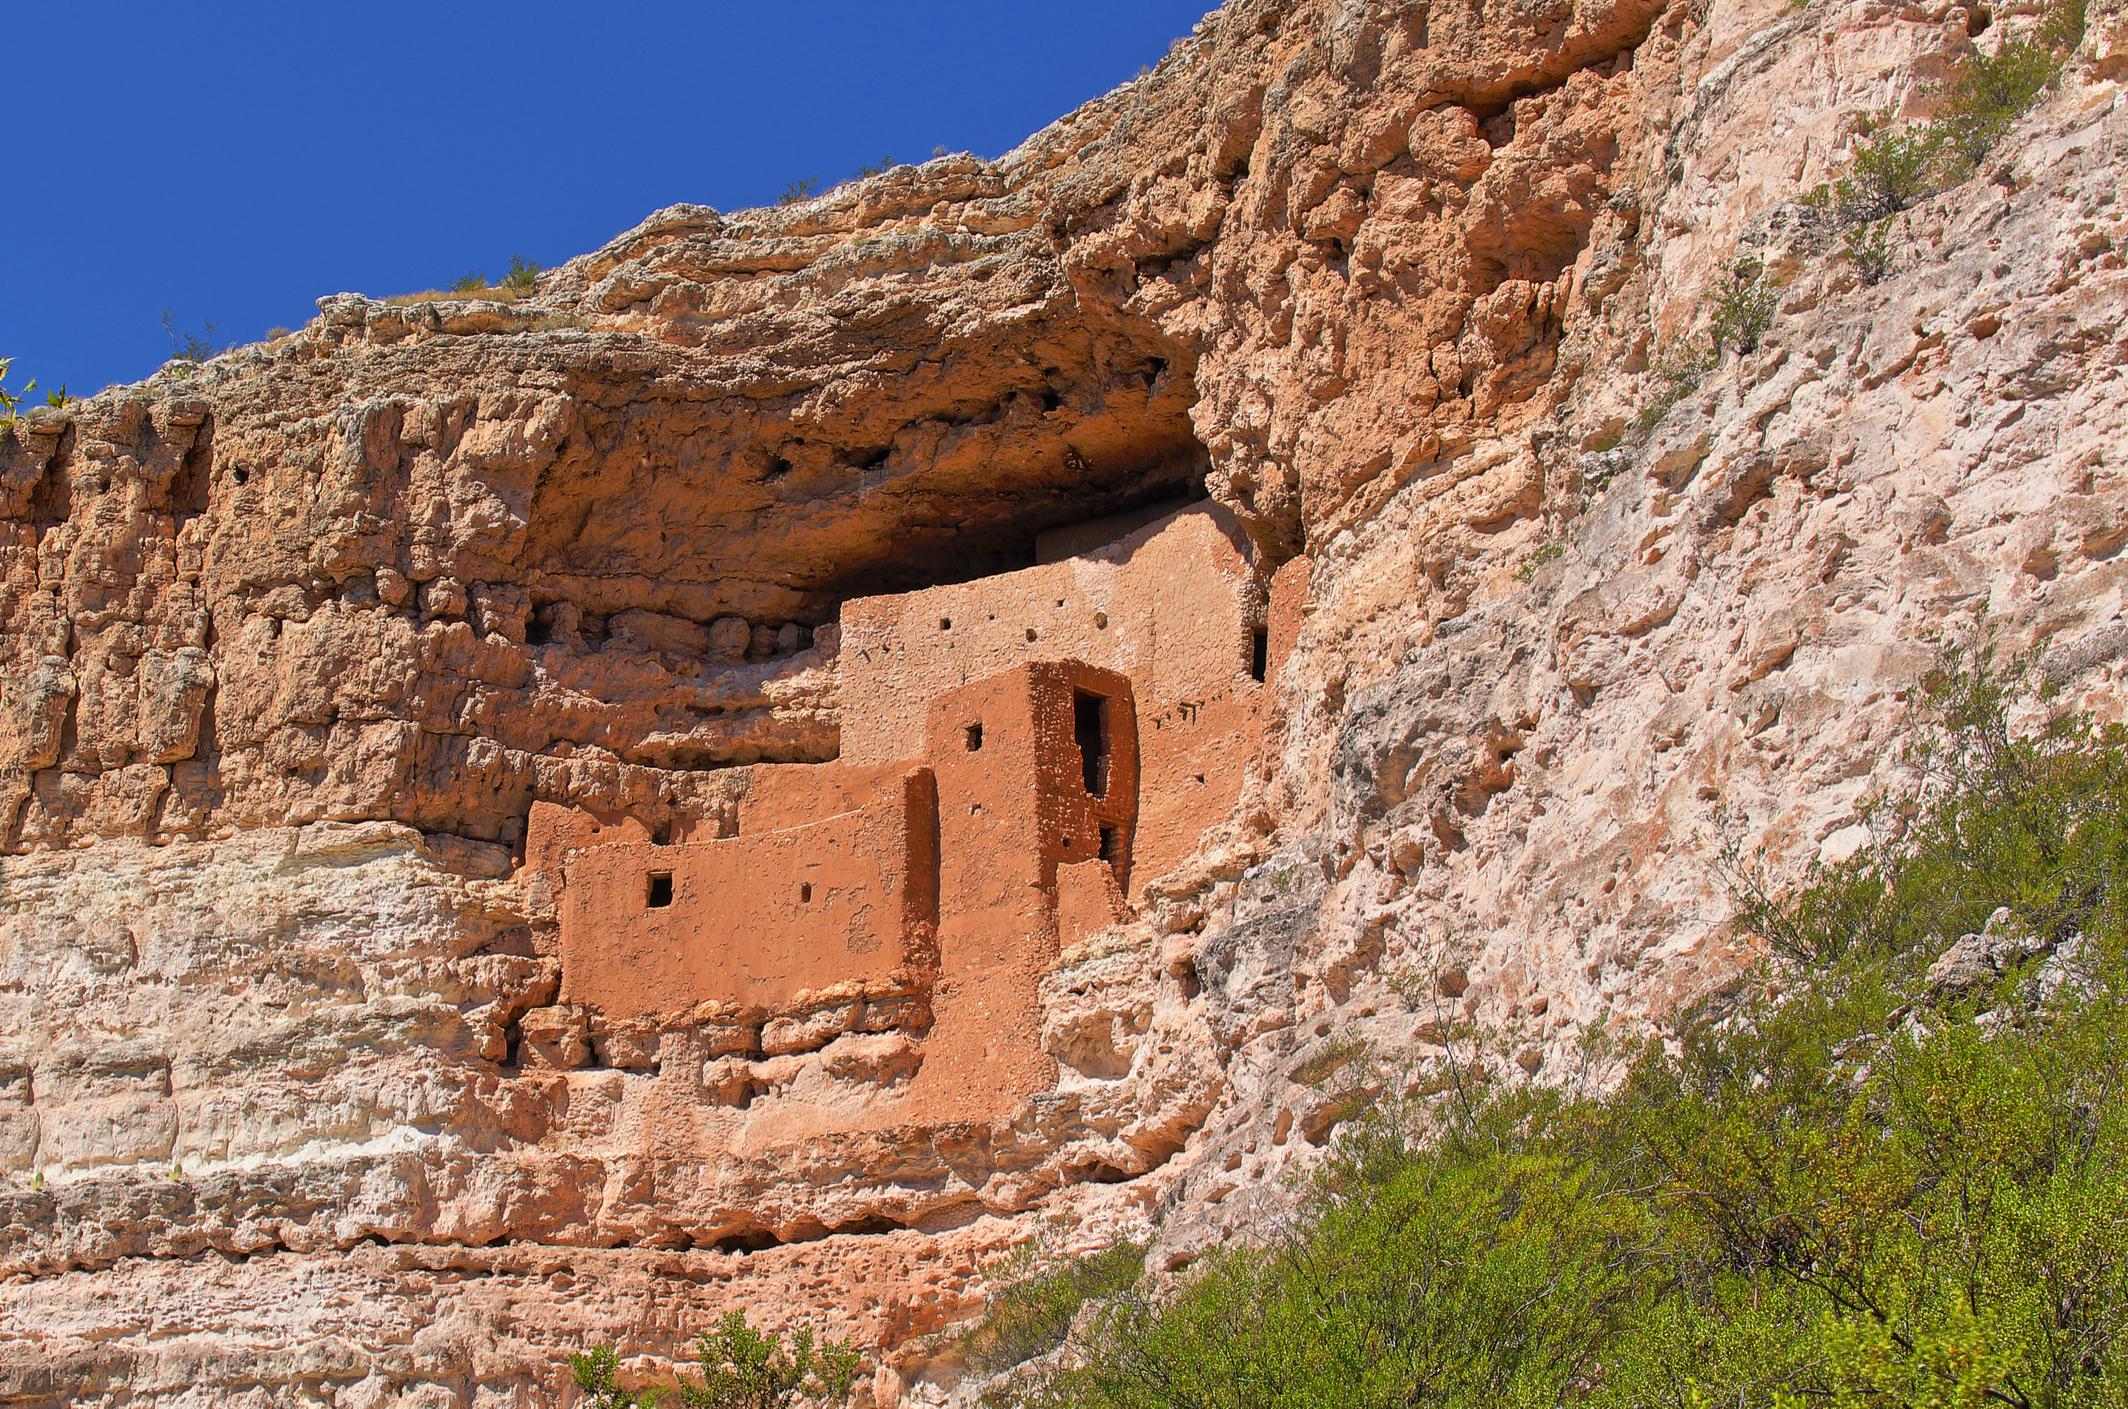 A pueblo complex on a rock face.